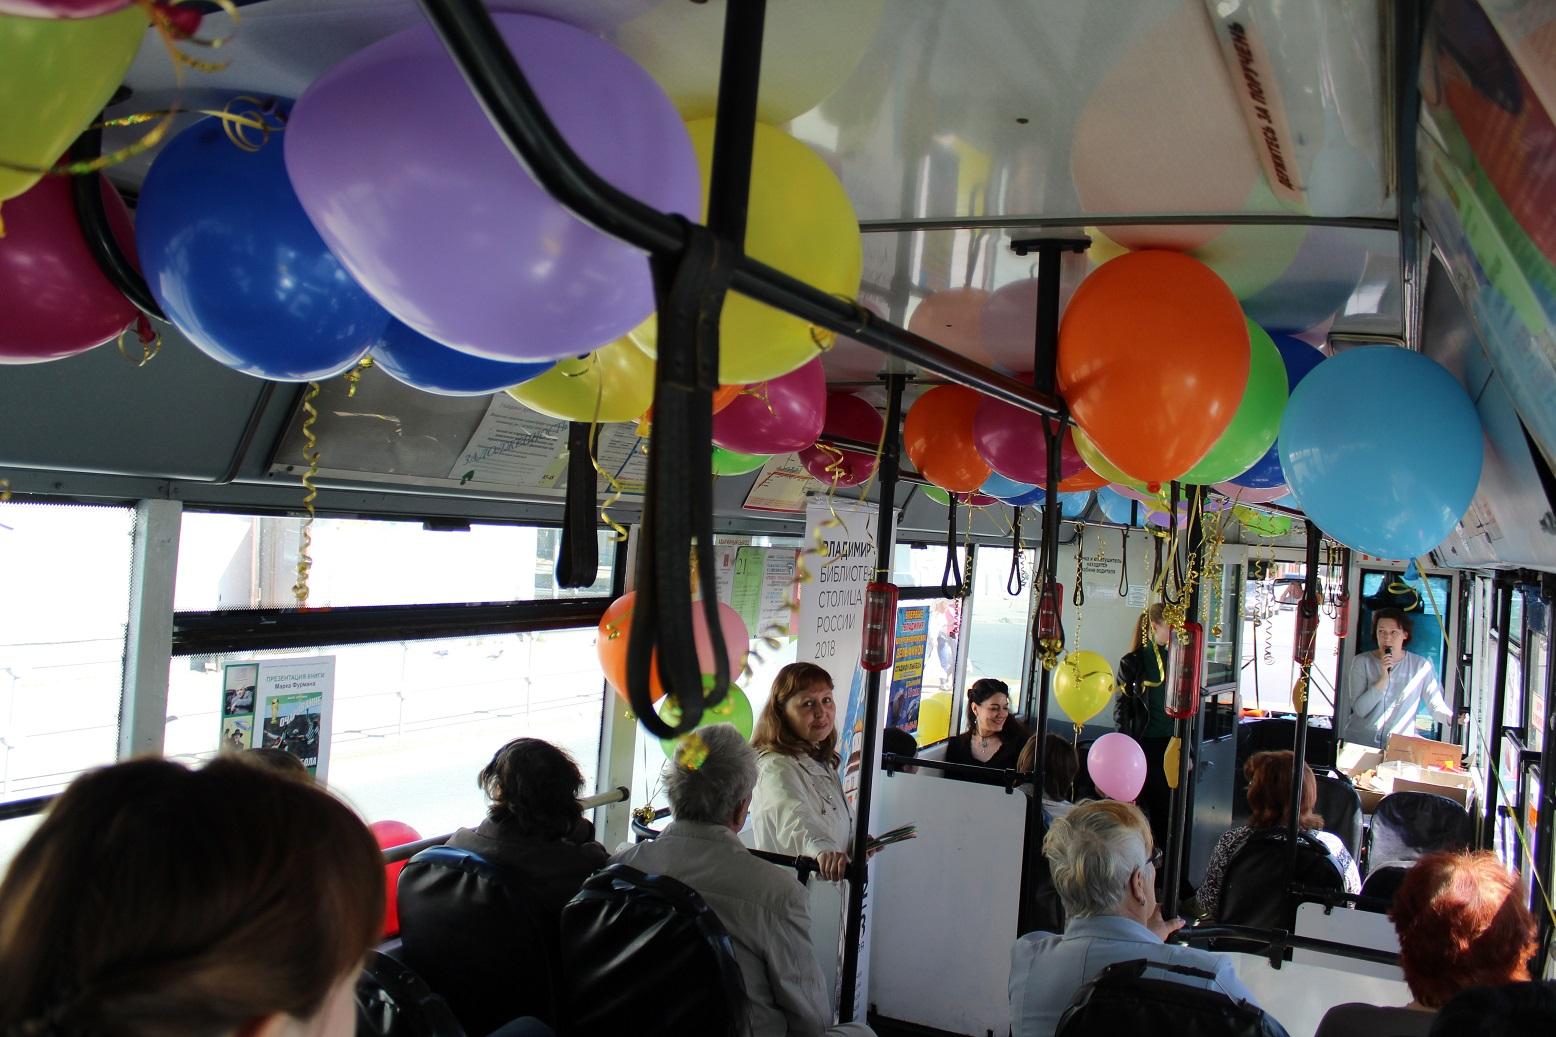 Literaturnyi trolleybus 6